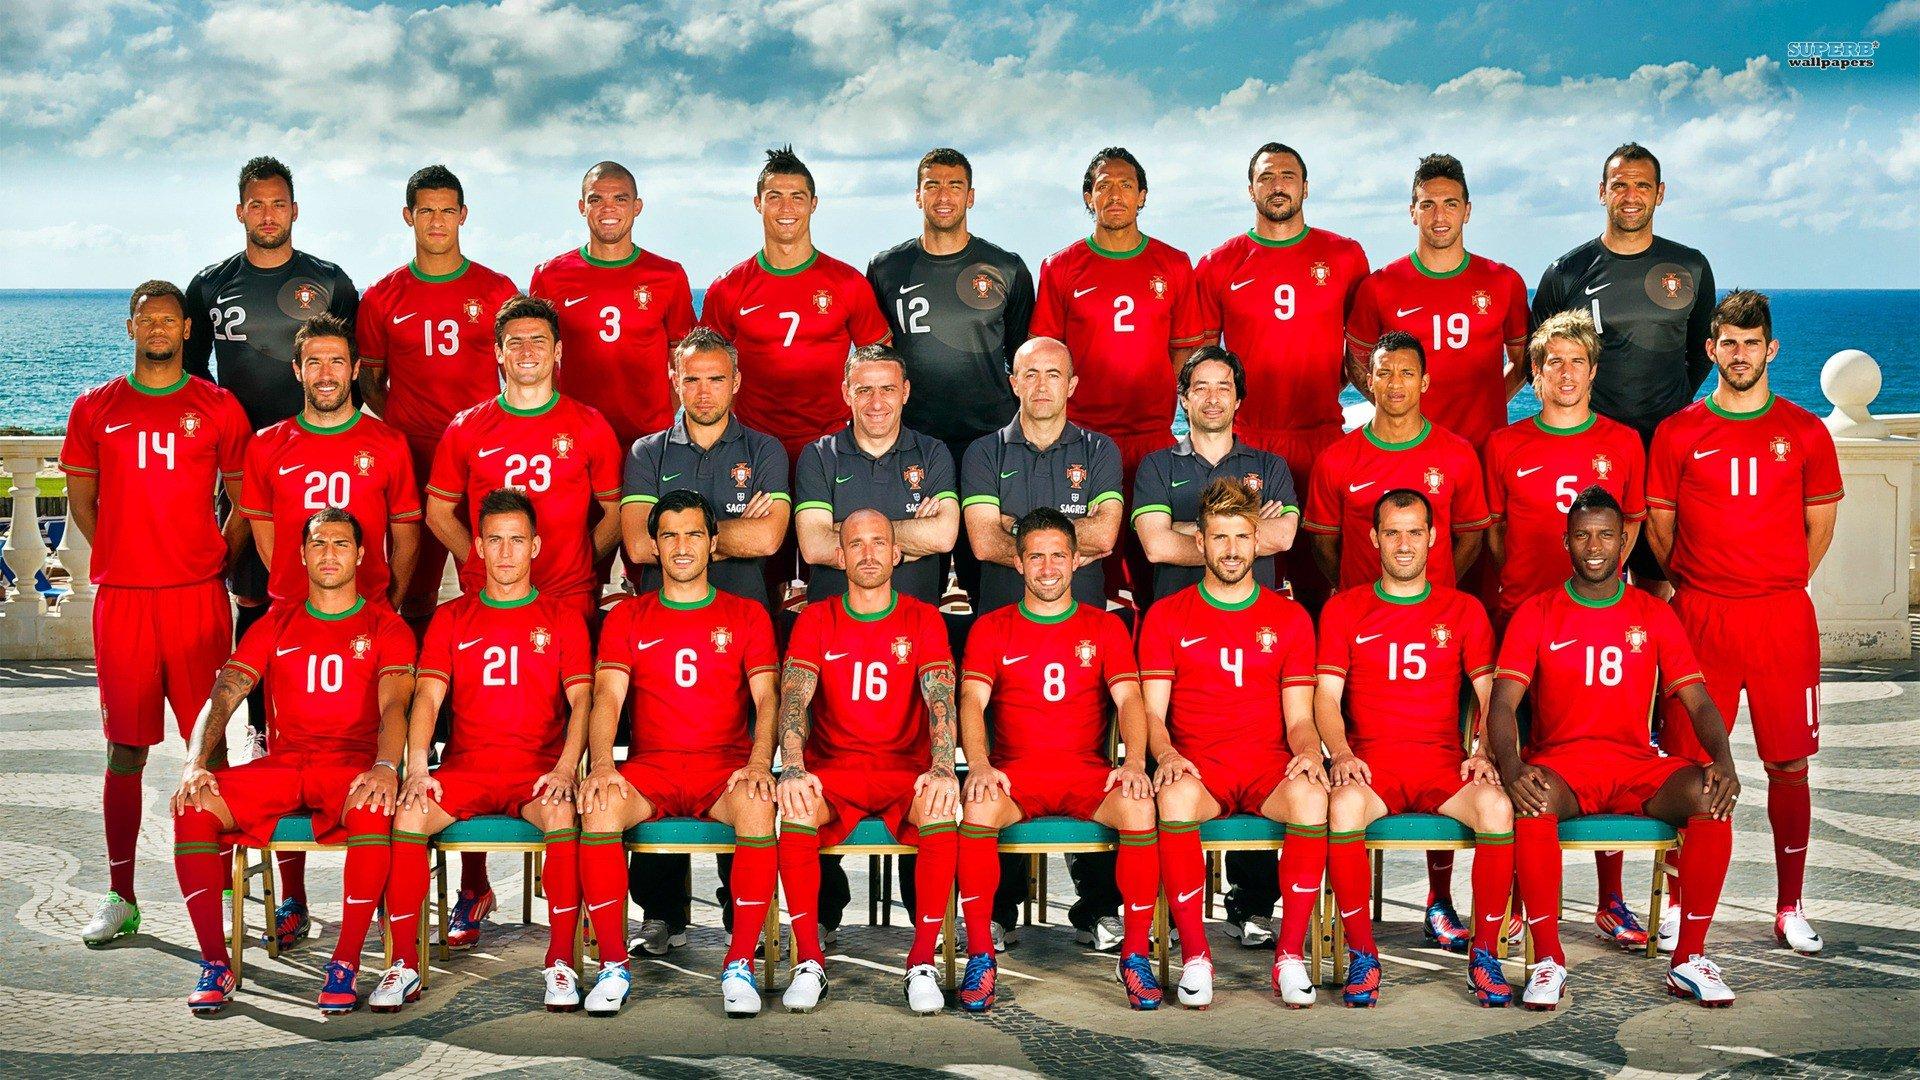 Sports soccer Portugal Portugal National Football Team 1920x1080